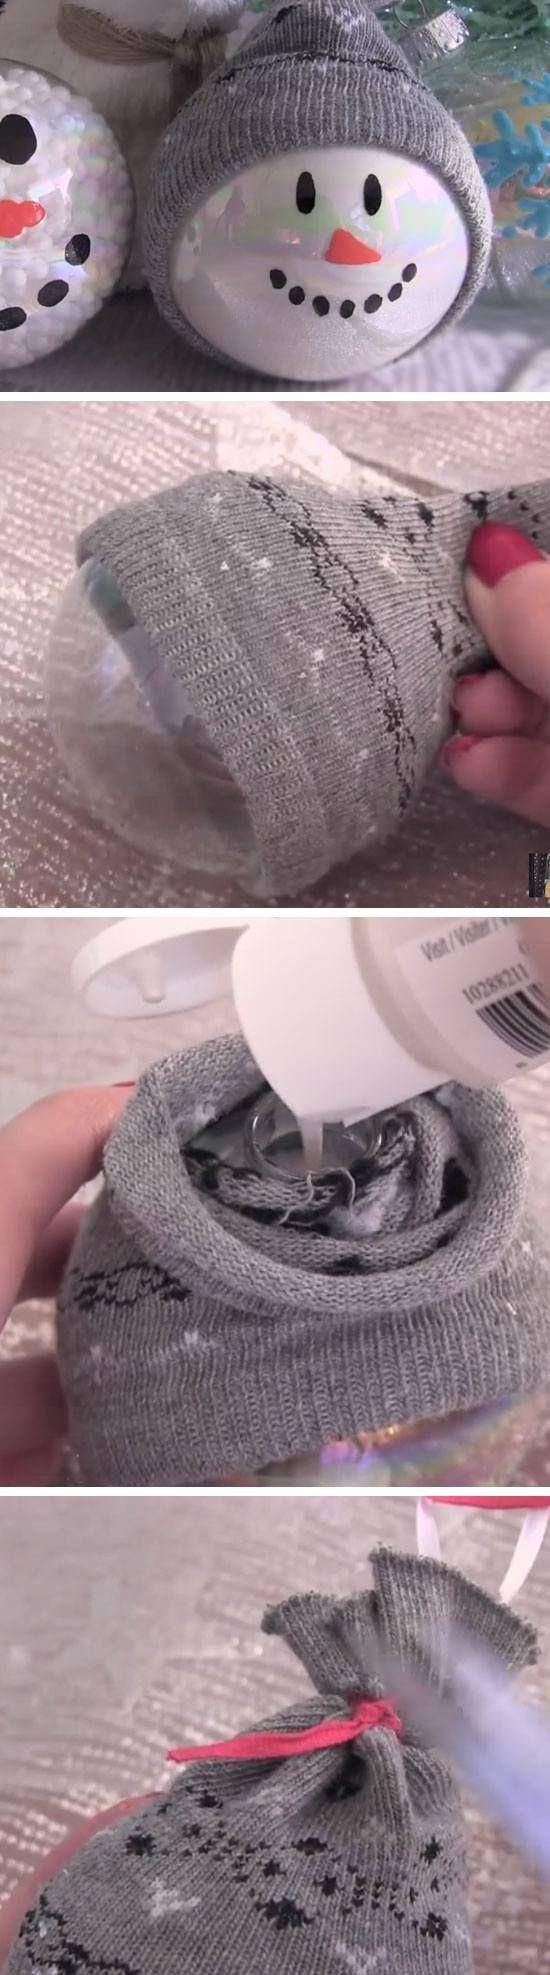 DIY Sock Snowman Ornament | Dollar Store DIY Christmas Decor Ideas on a Budget